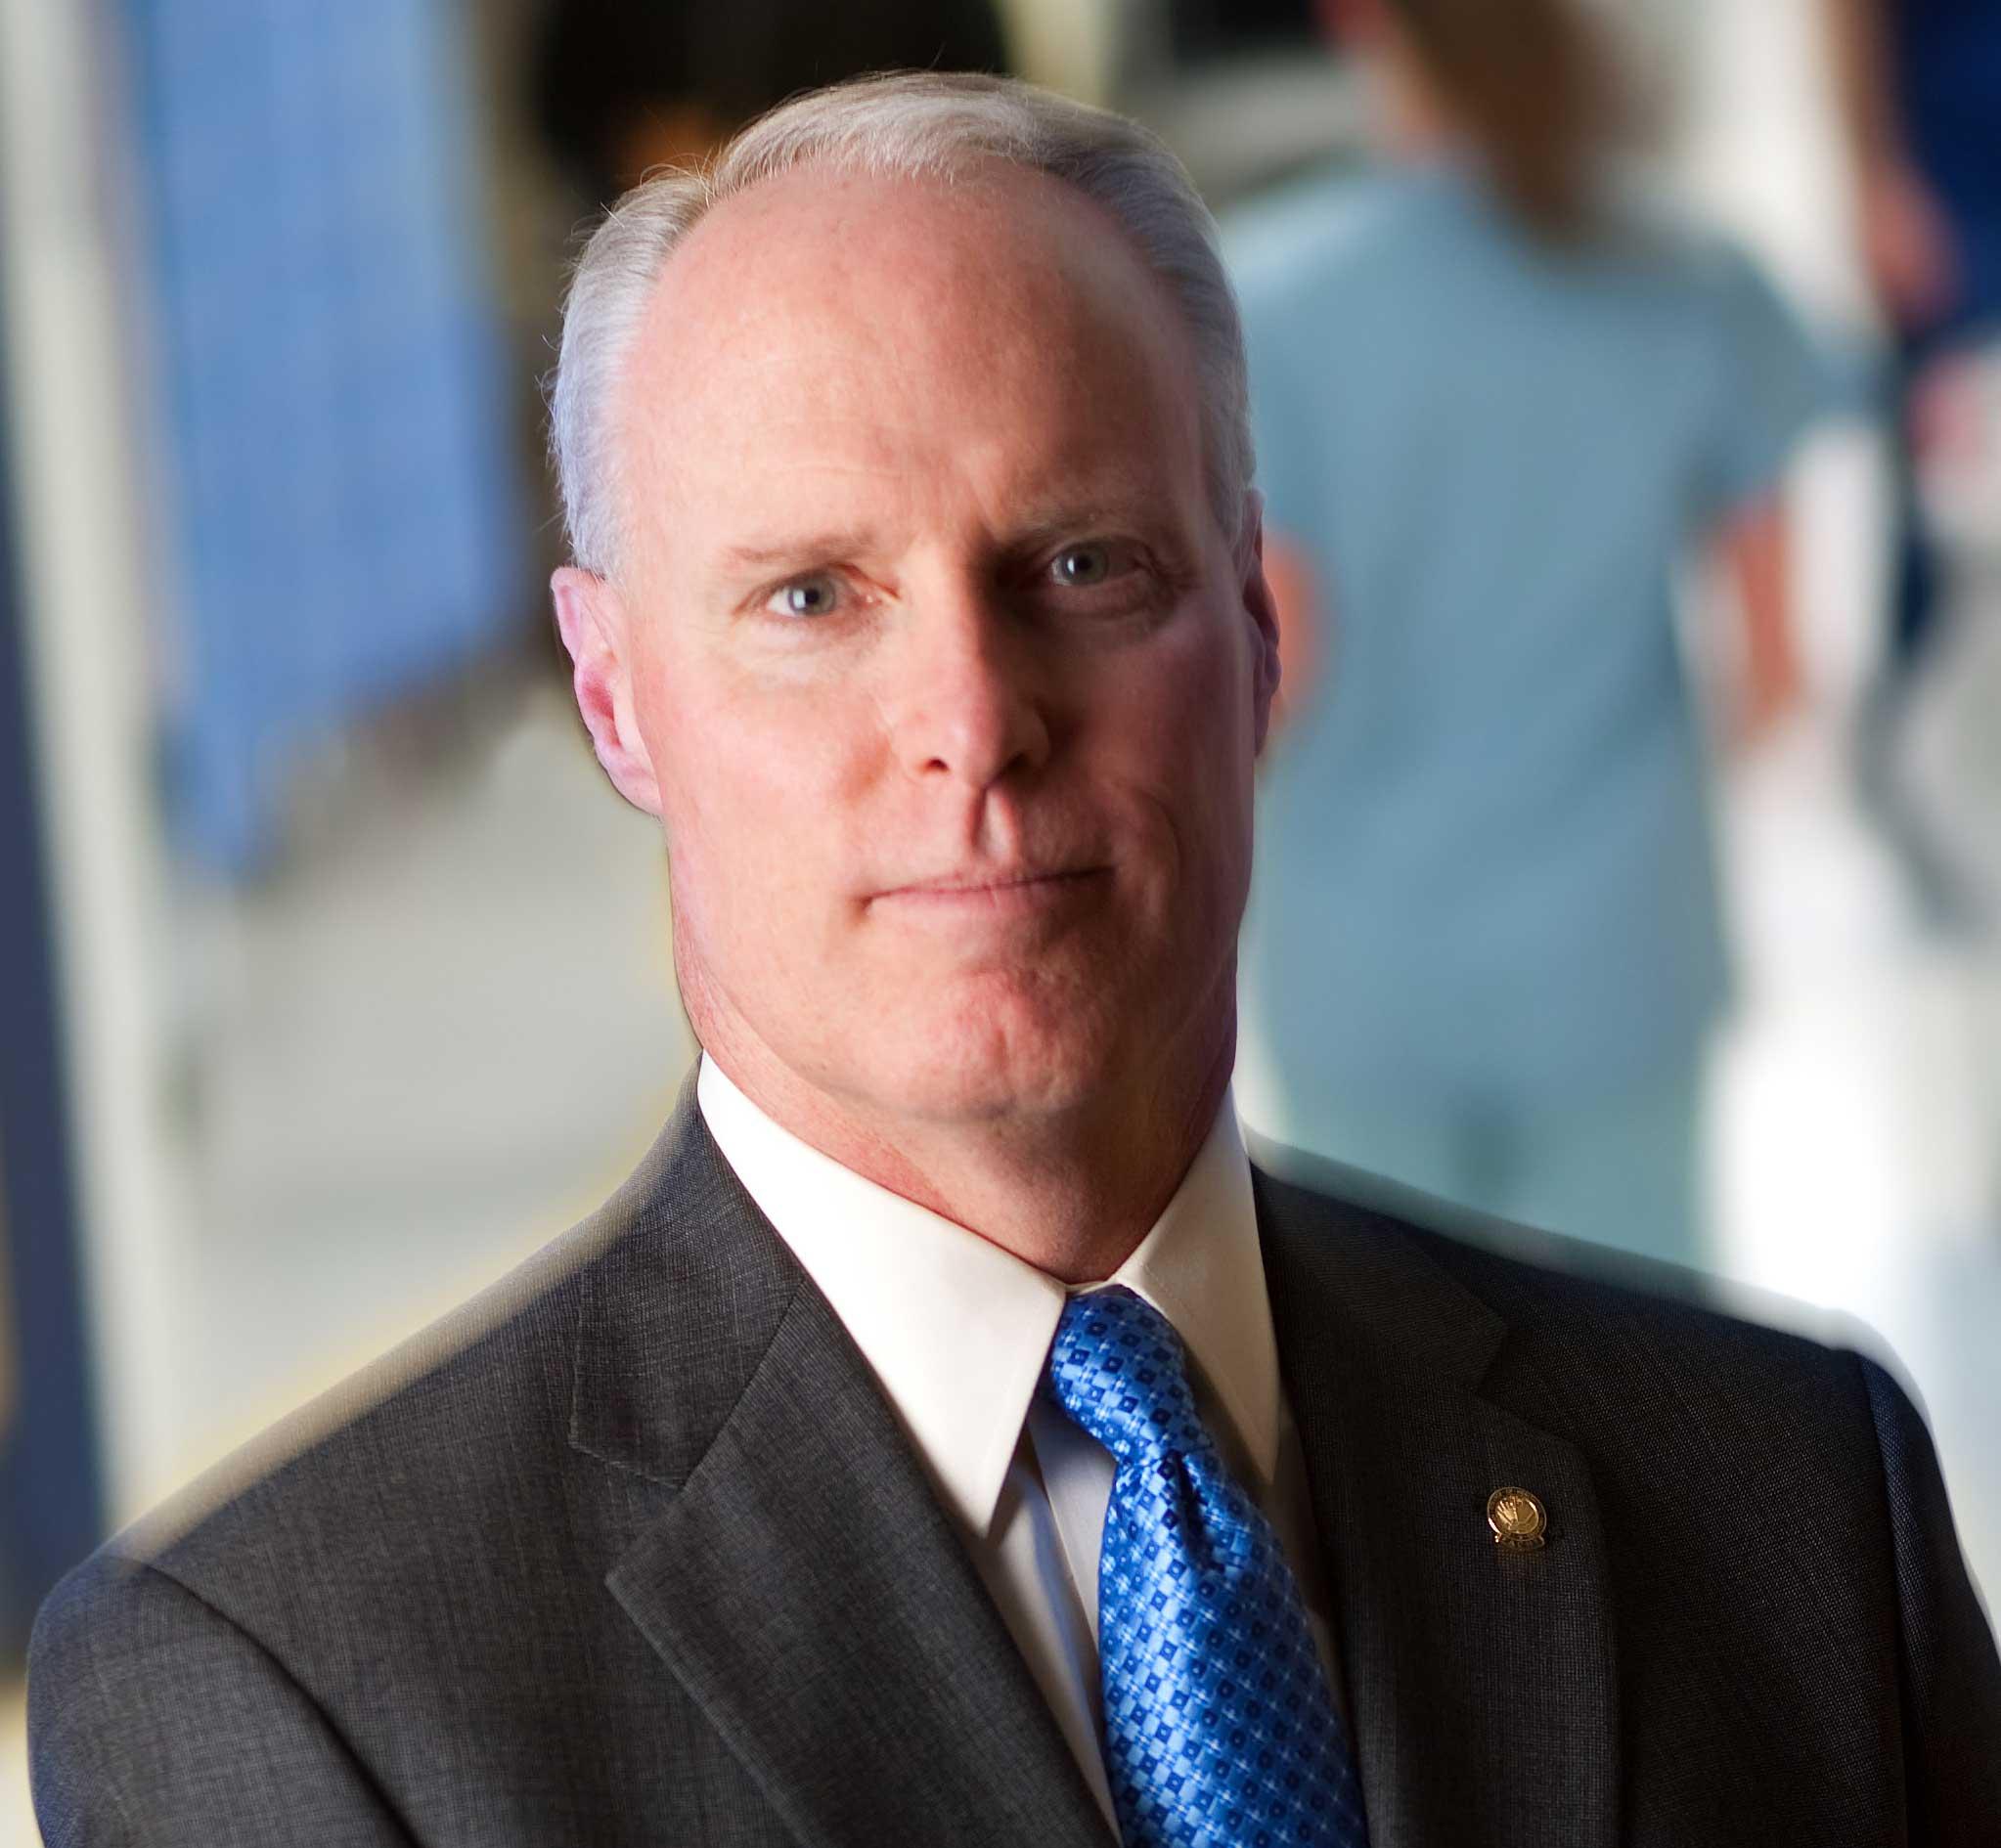 Chris Van Gorder, Scripps Health